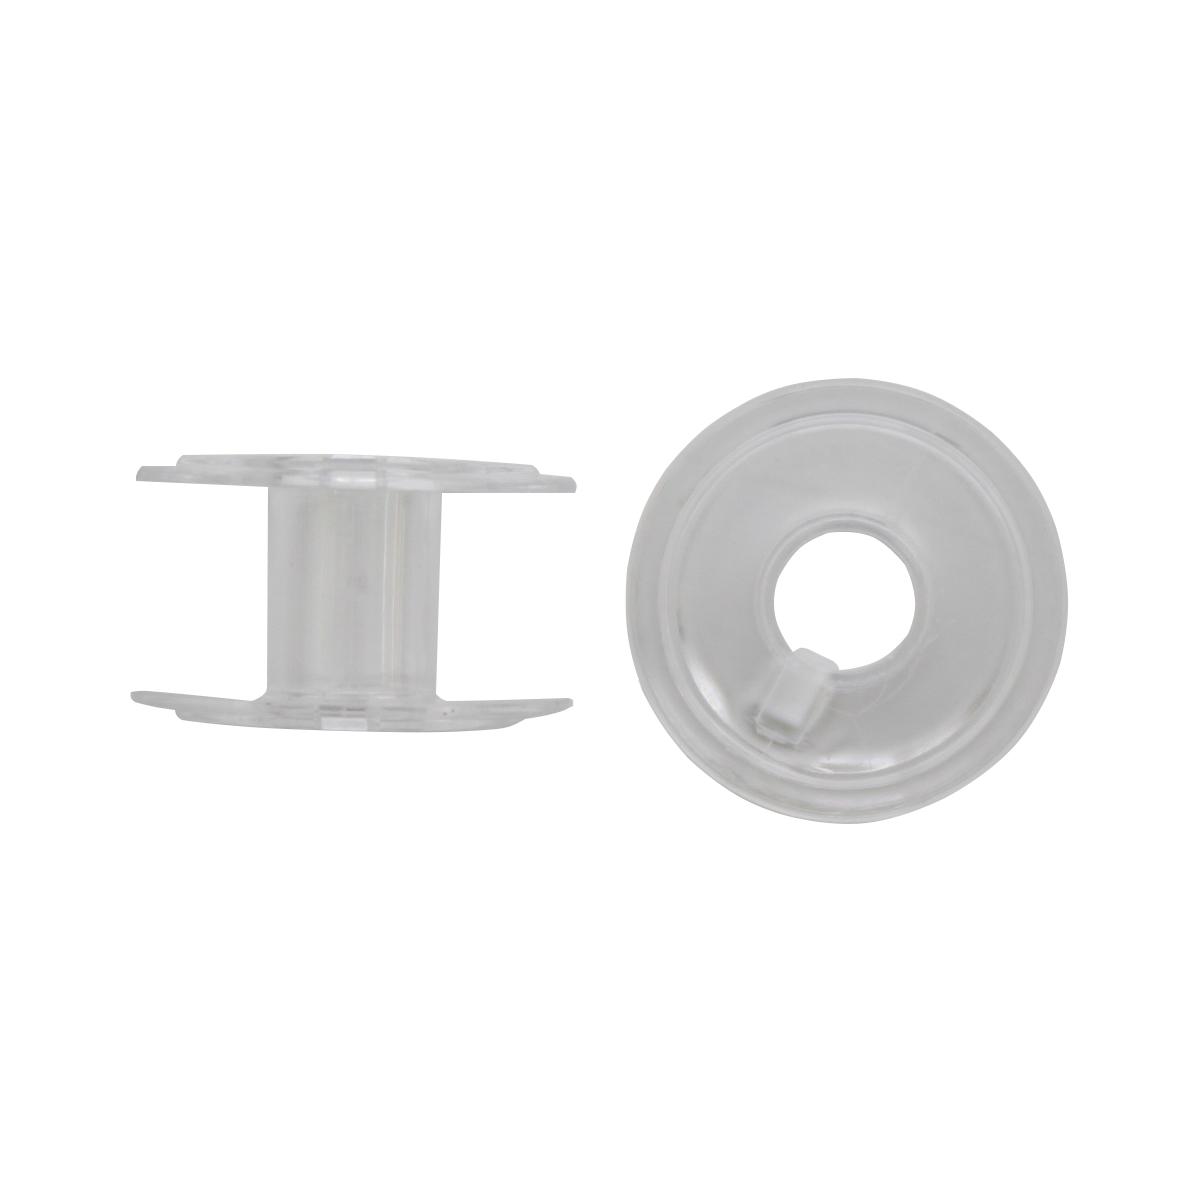 Bestex Шпулька пластиковая ТВ-В01, 0350-0000, прозрачная, 10 шт